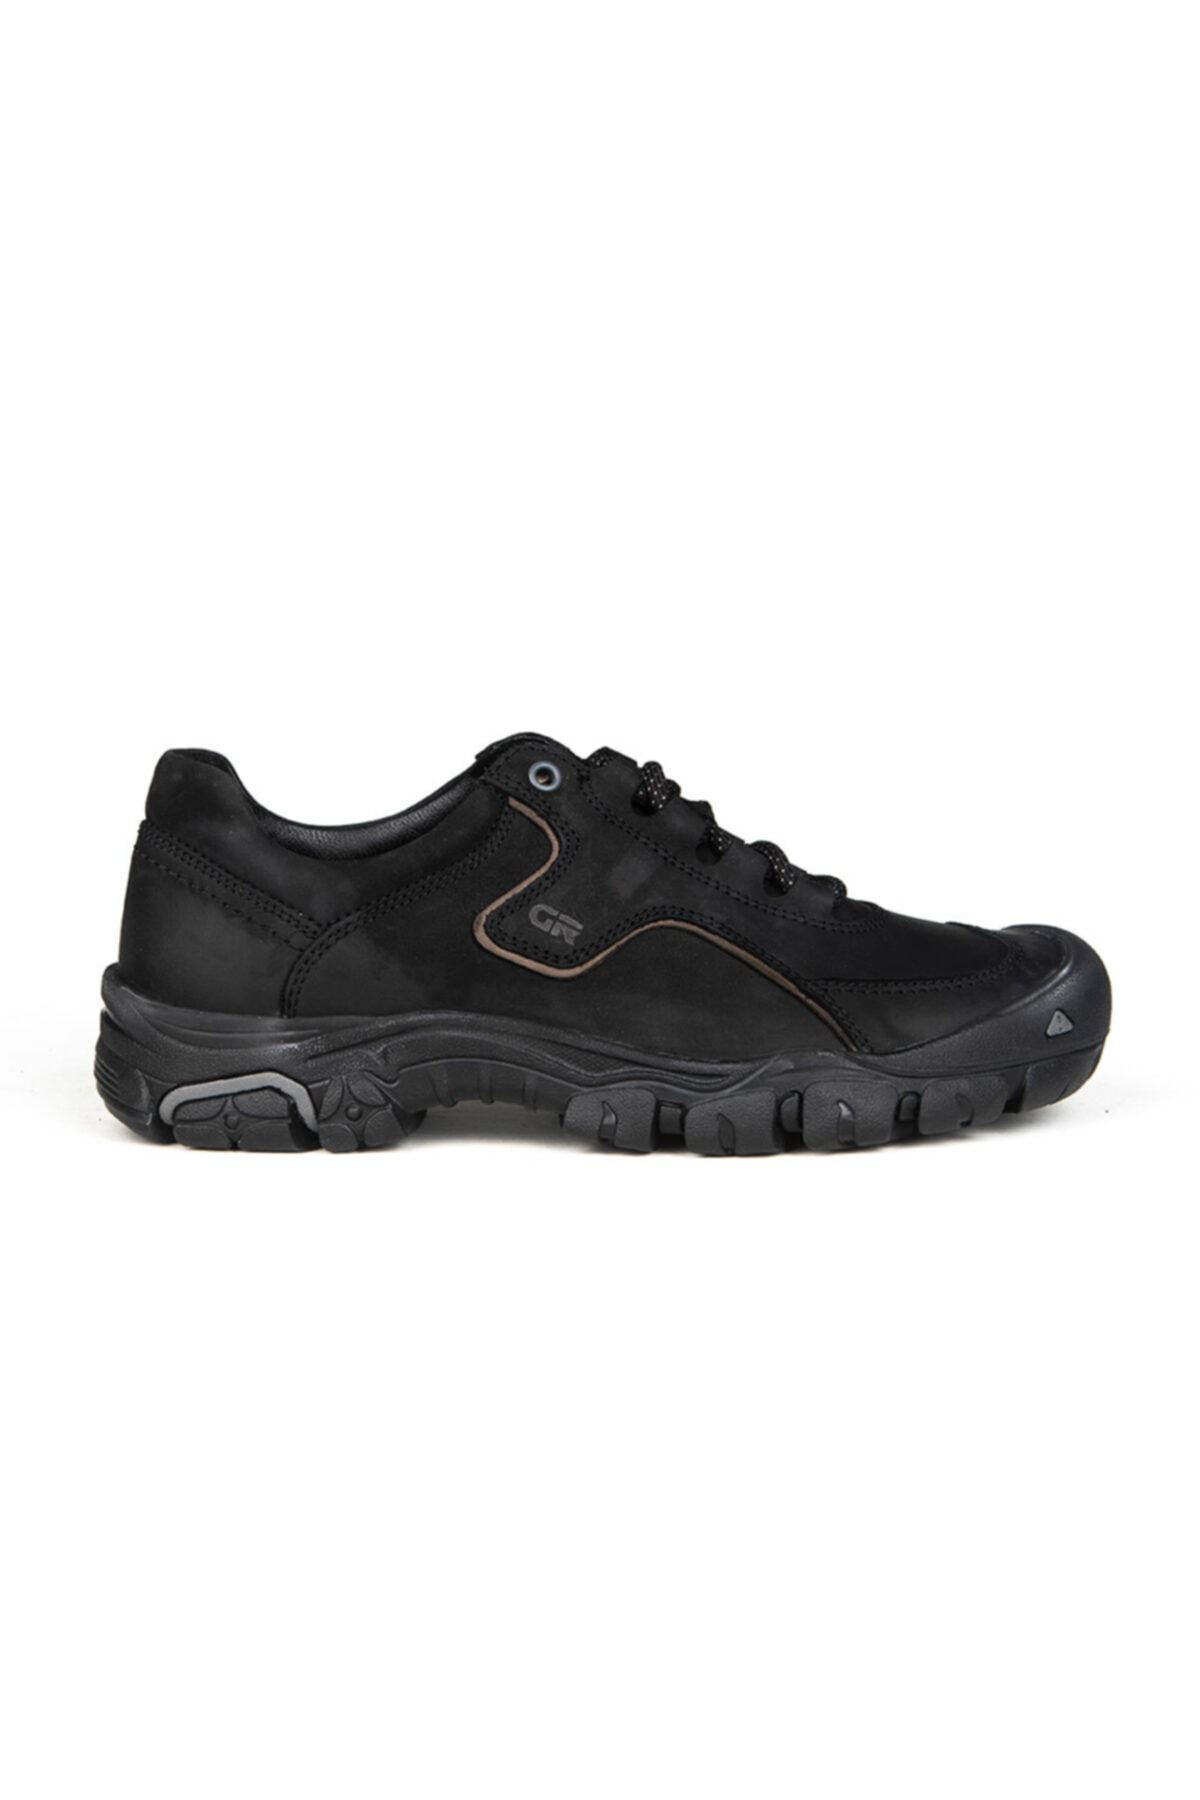 خرید کفش کوهنوردی 2020 مردانه برند گریدر رنگ مشکی کد ty105014897